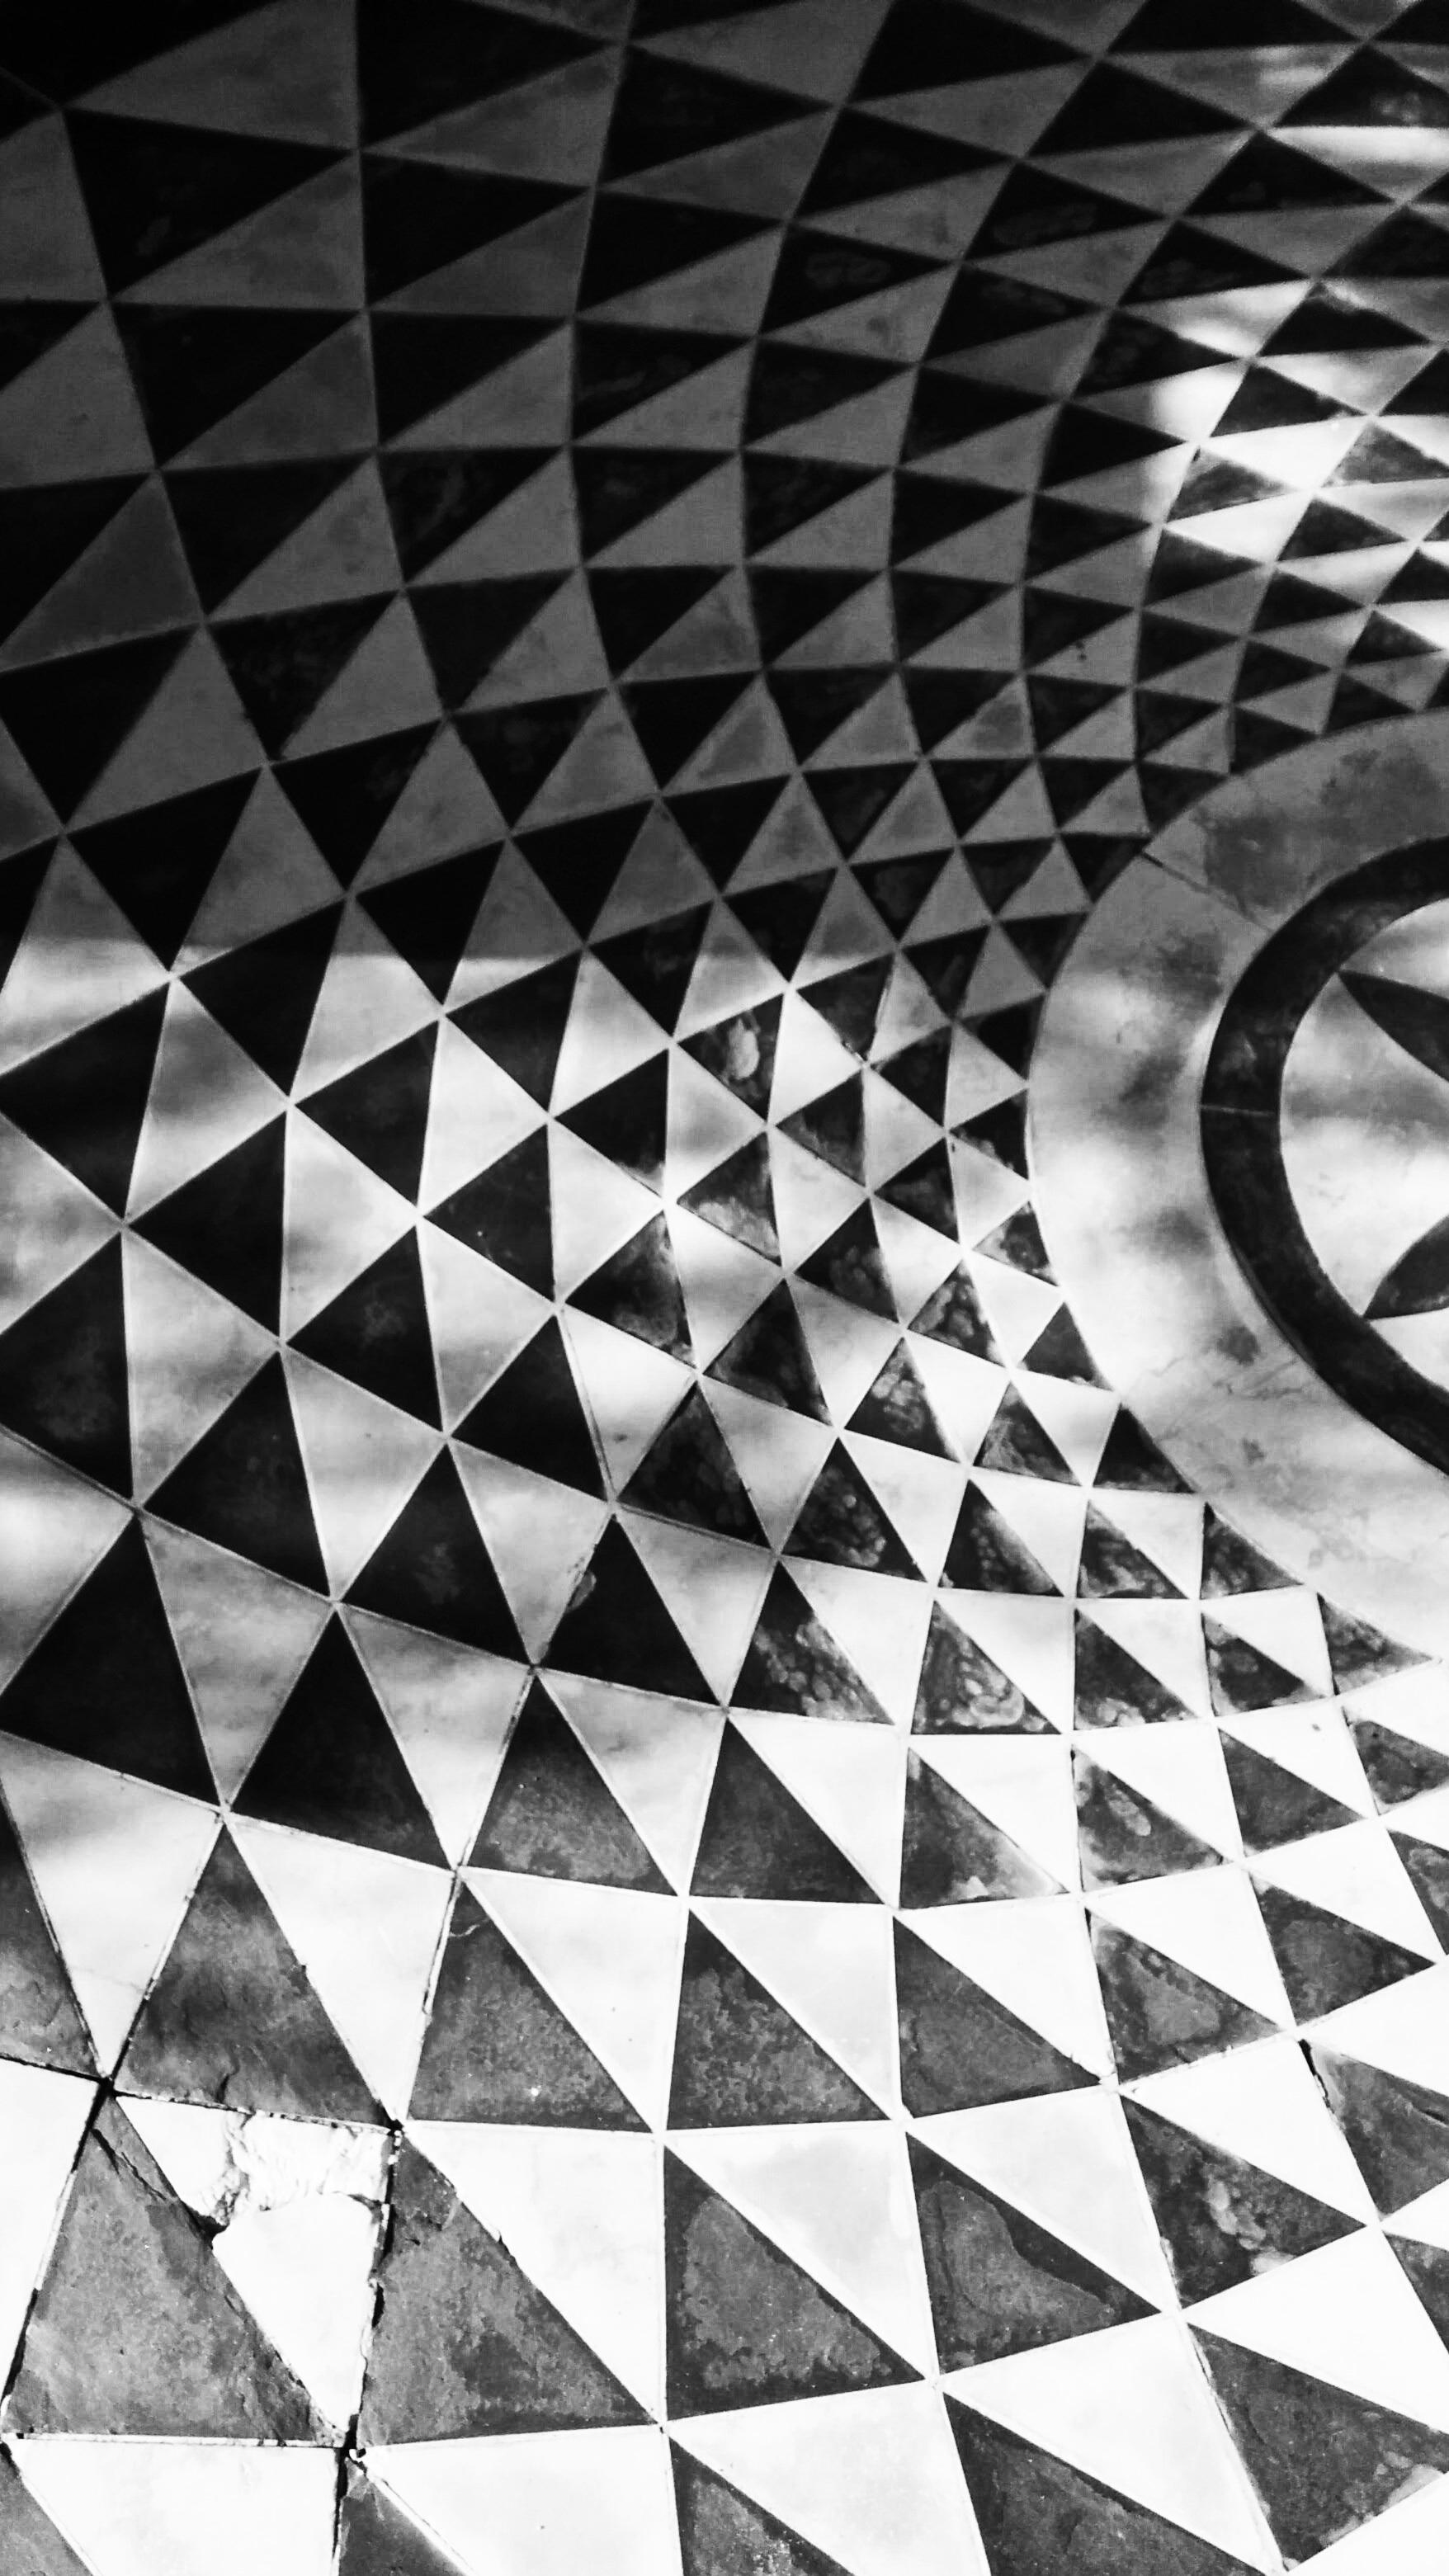 Gambar Hitam Dan Putih Tekstur Spiral Lantai Pola Garis